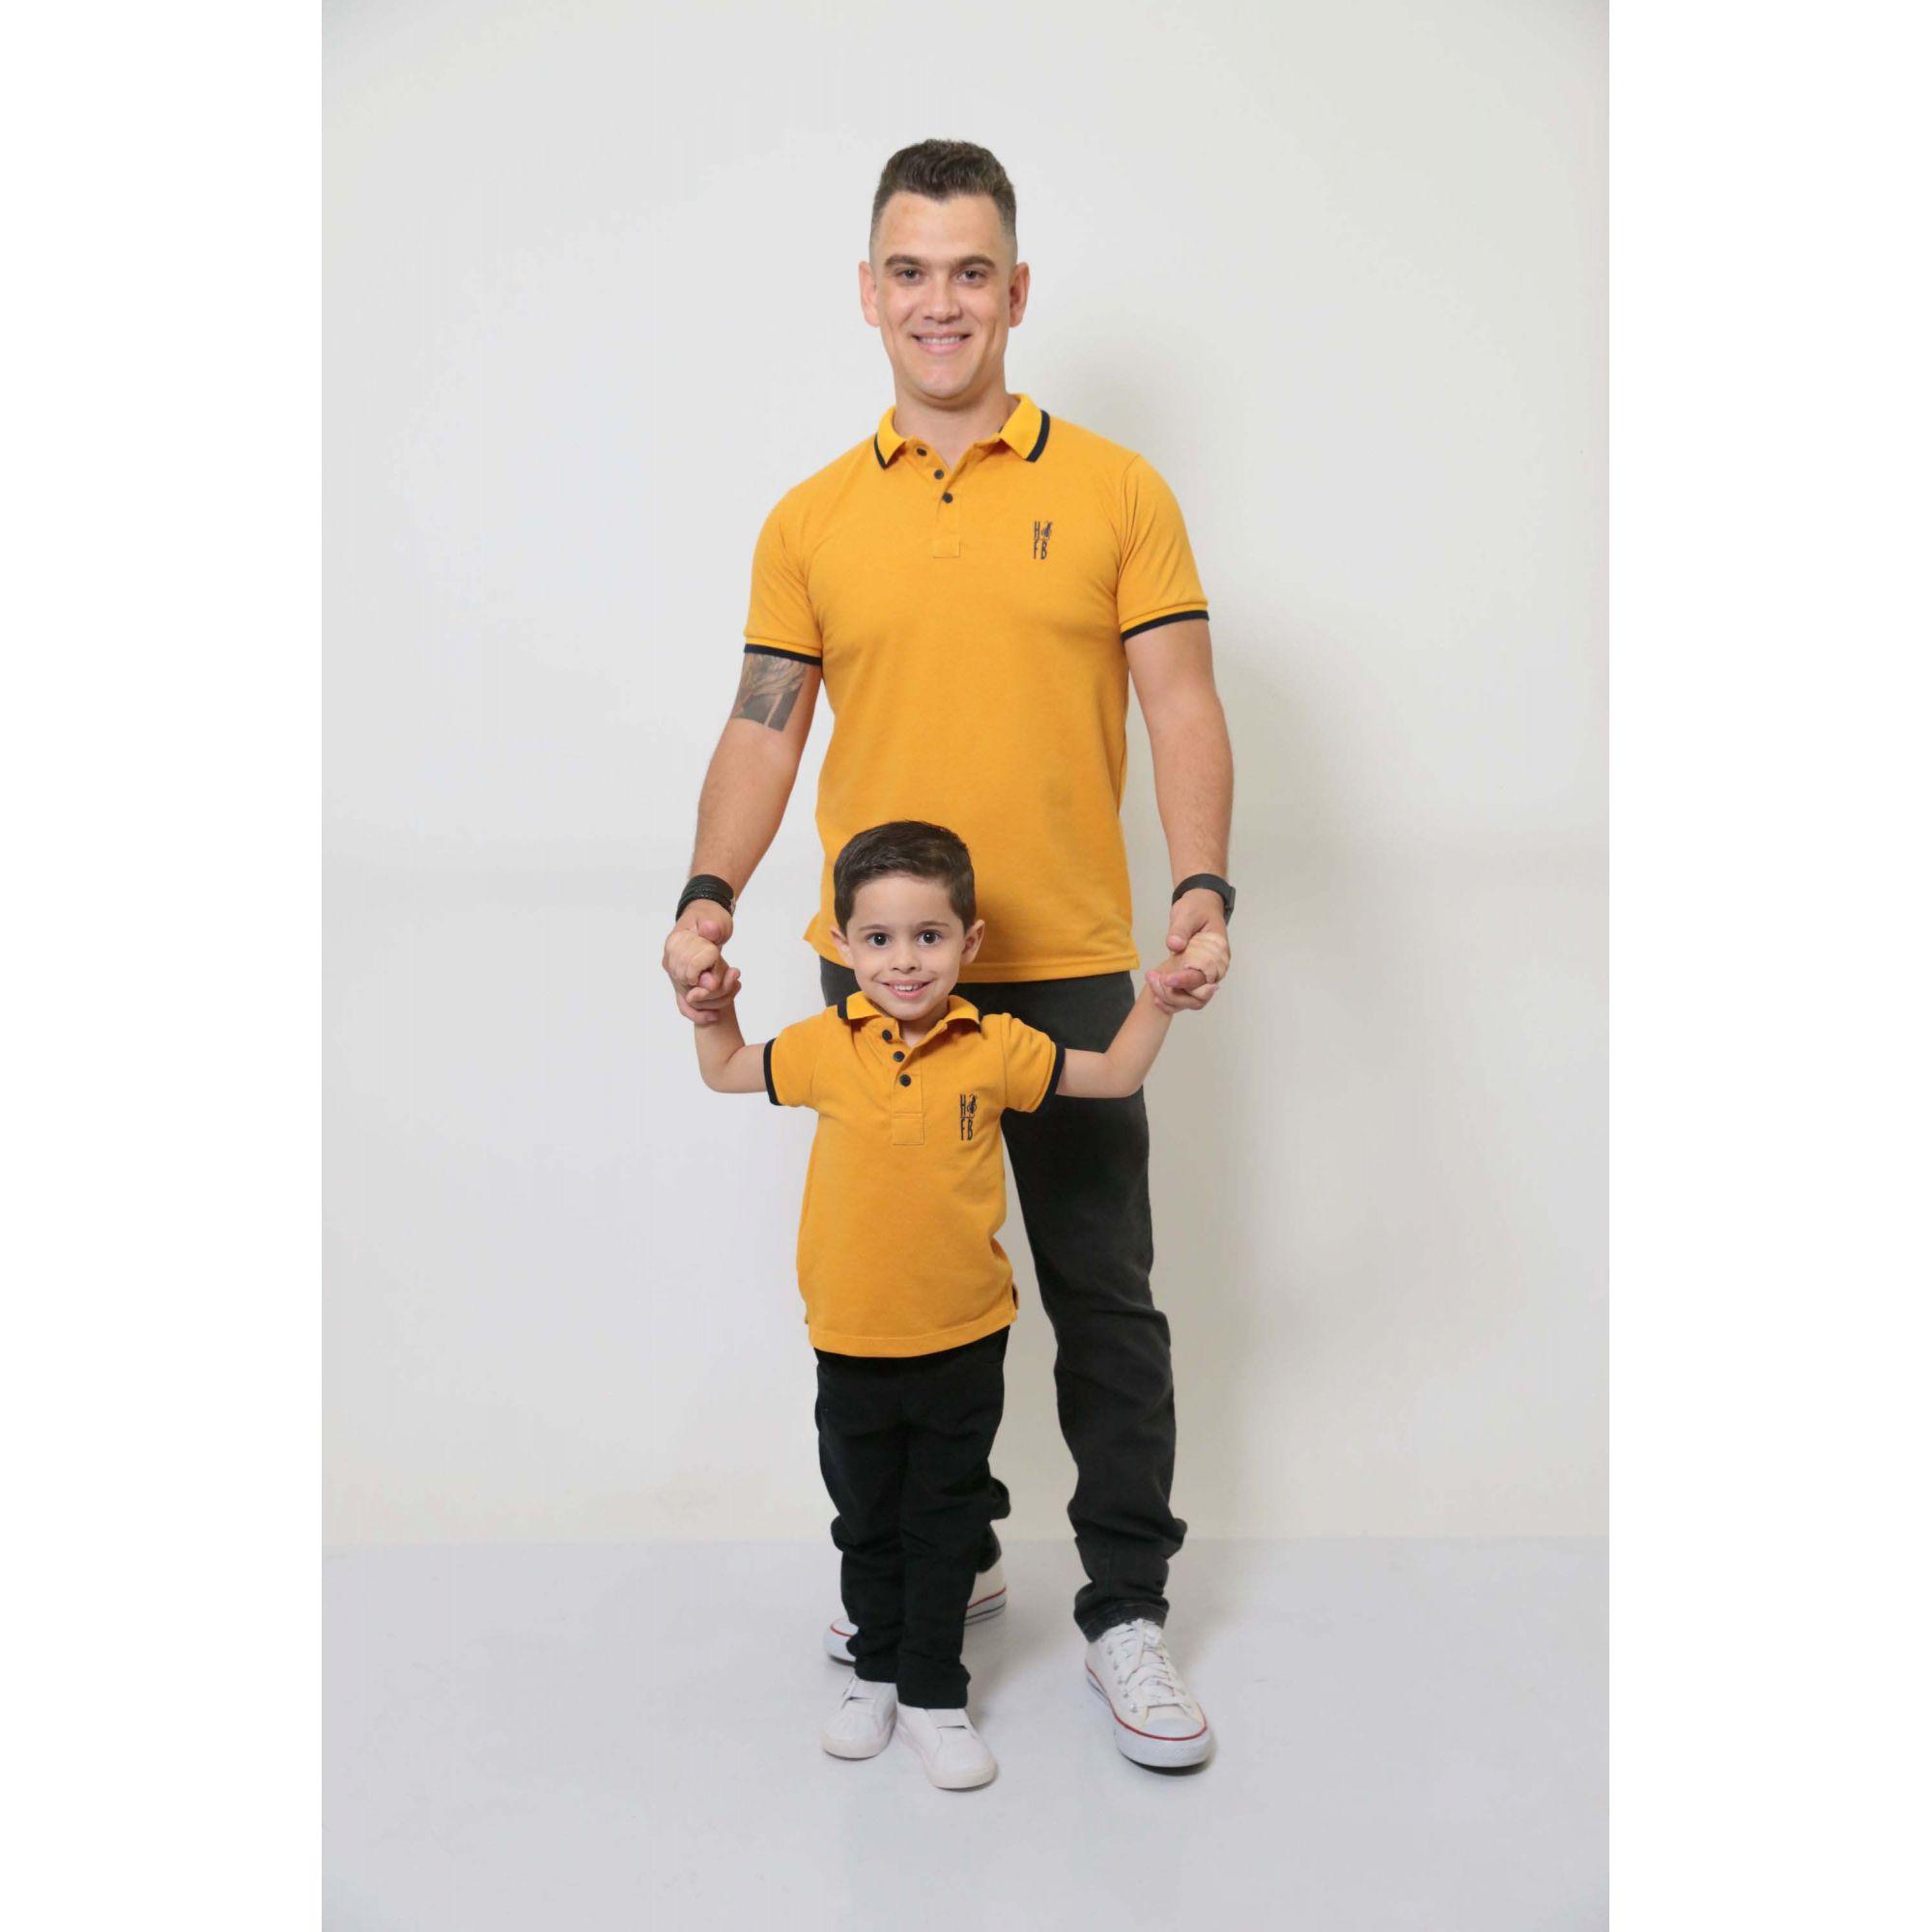 PAI E FILHO > Kit 02 Camisas ou Body Polo Mostarda  [Coleção Tal Pai Tal Filho]  - Heitor Fashion Brazil